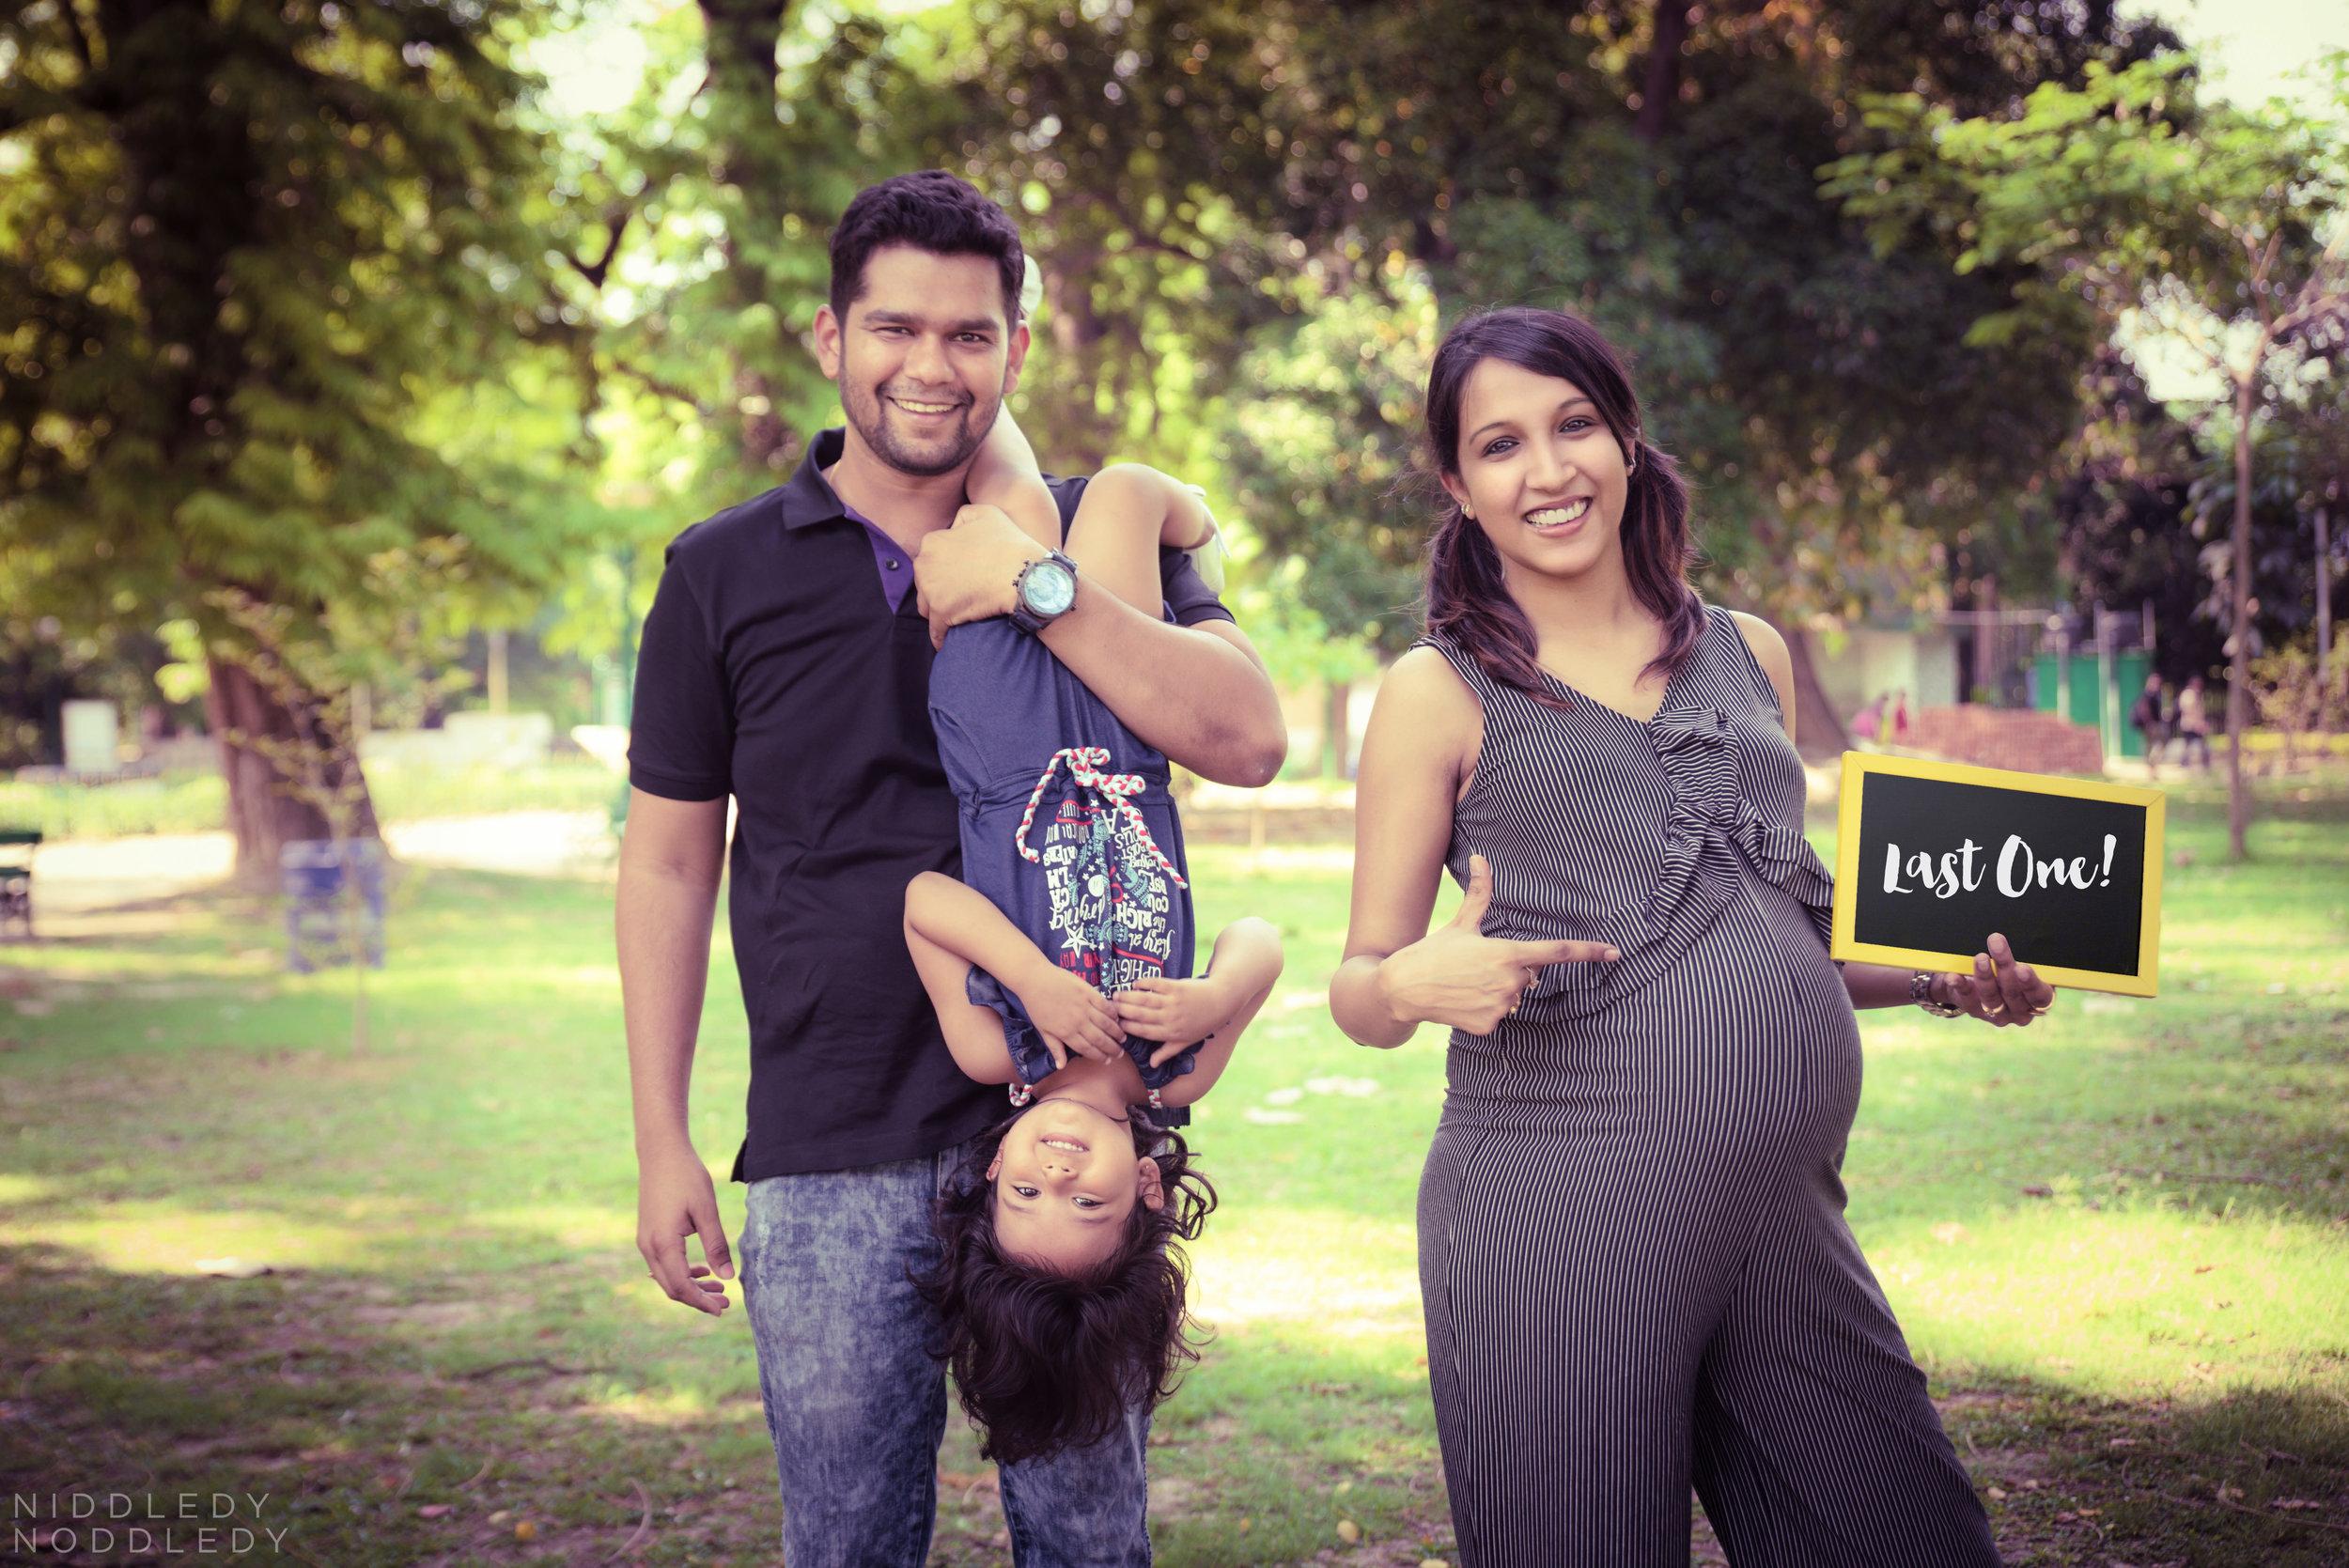 Preksha Maternity Photoshoot ❤ NiddledyNoddledy.com ~ Bumps to Babies Photography, Kolkata - 12.jpg